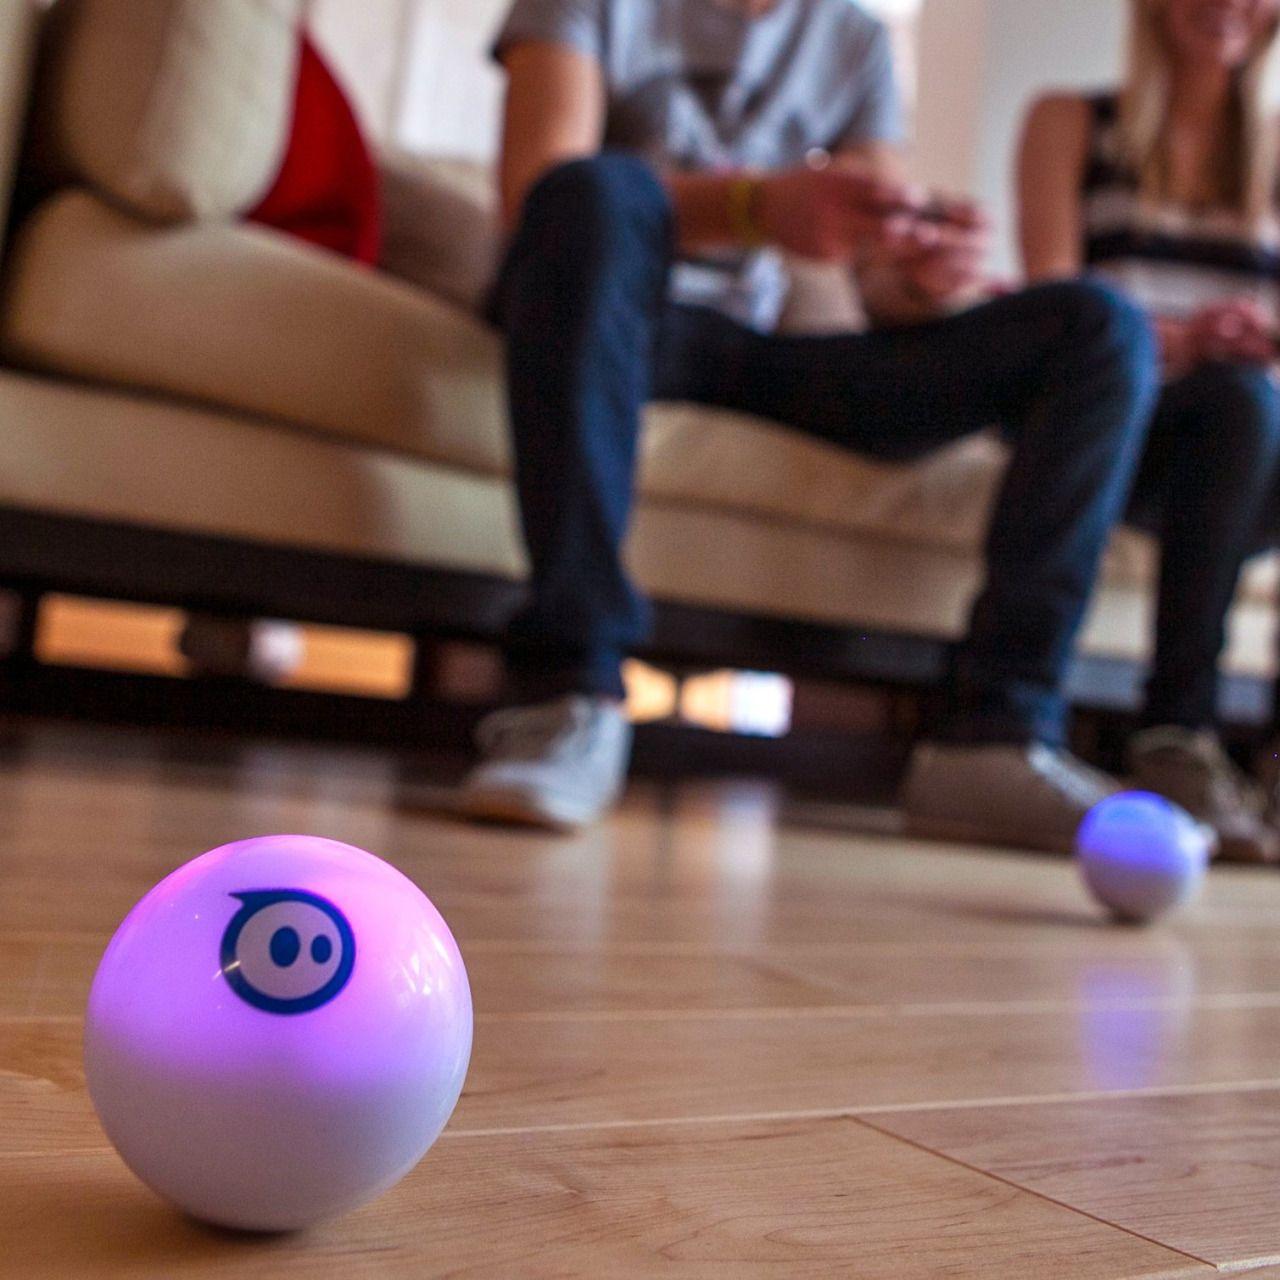 Amazing Gifts — Sphero 2.0 Robotic Ball. #gadgets #gosstudio #gift #giftideas ★ We recommend Gift Shop: http://www.zazzle.com/vintagestylestudio ★